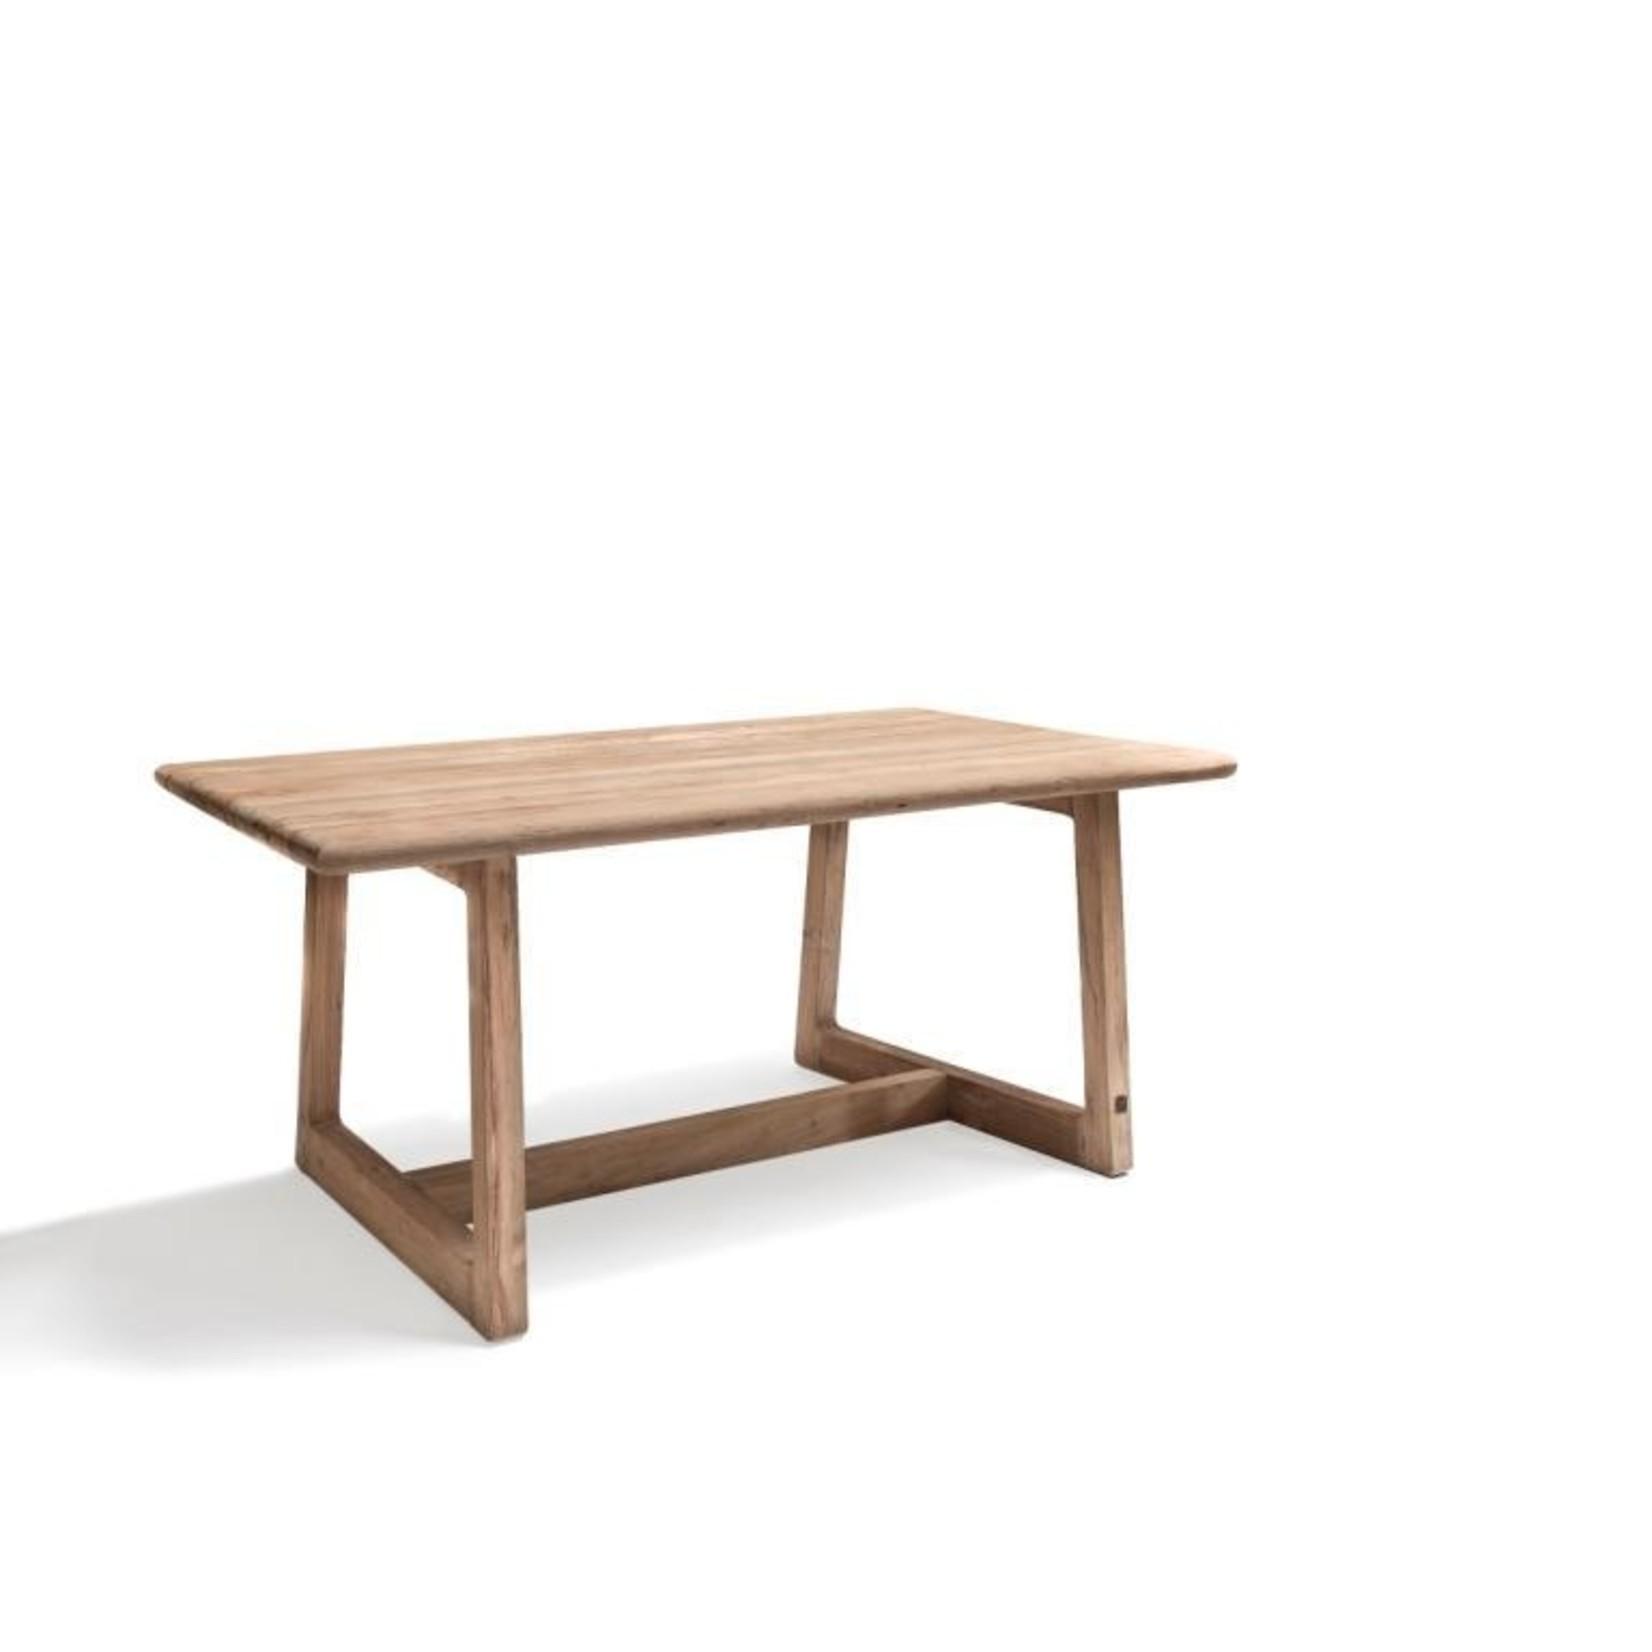 Gommaire Rectangular Table Dennis Small   Reclaimed Teak Natural Gray